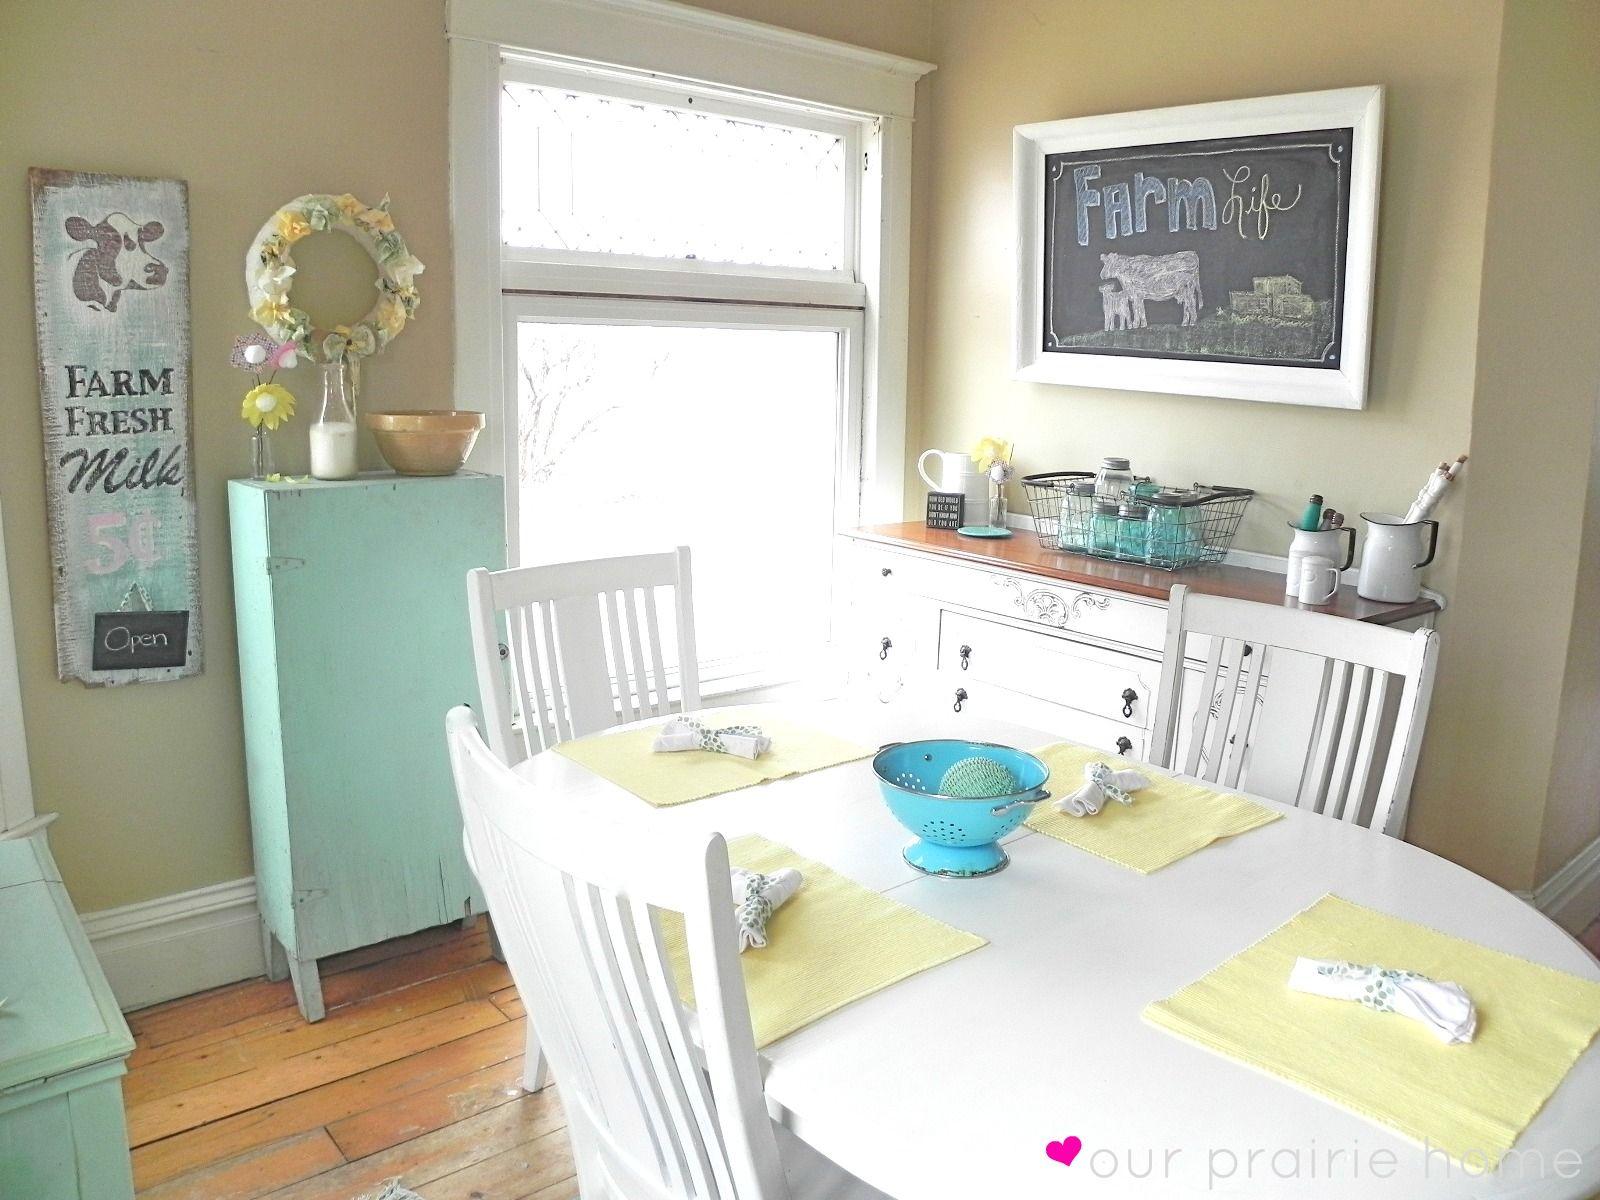 Our Prairie Home: Dining Room {A Reveal}    Fun & fresh farmhouse dining room